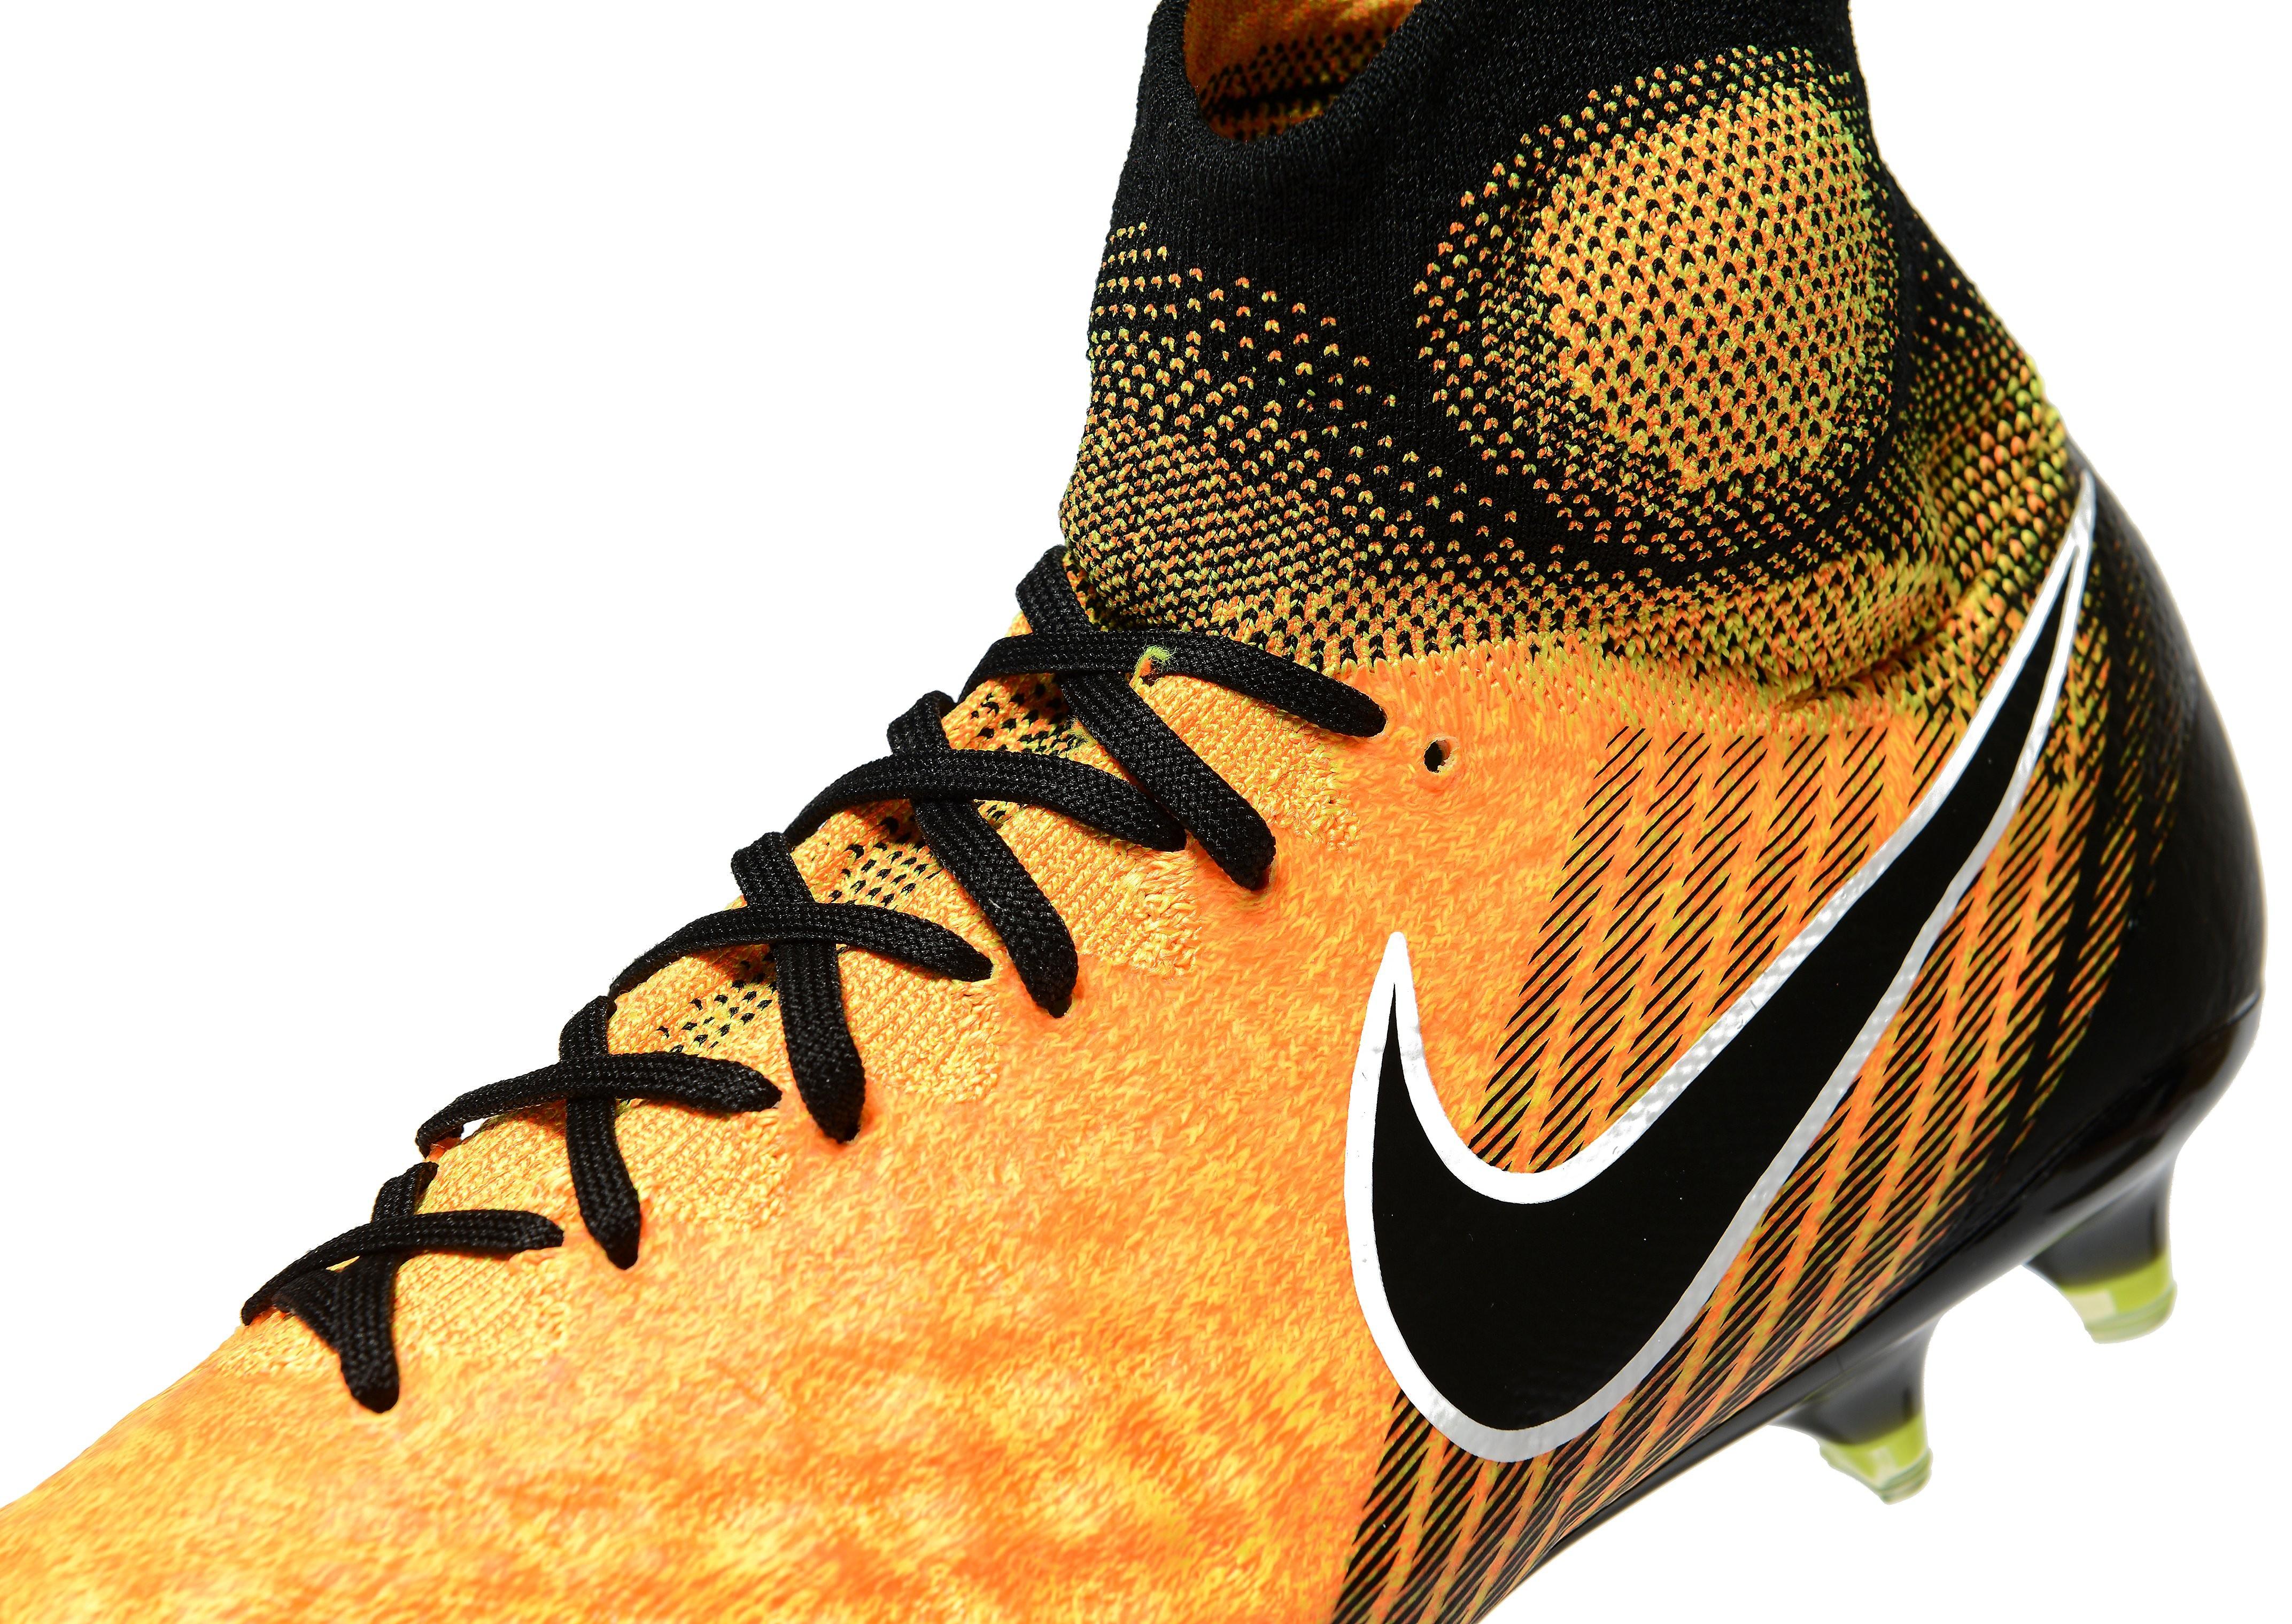 Nike Lock In Let Loose Magista Obra II FG